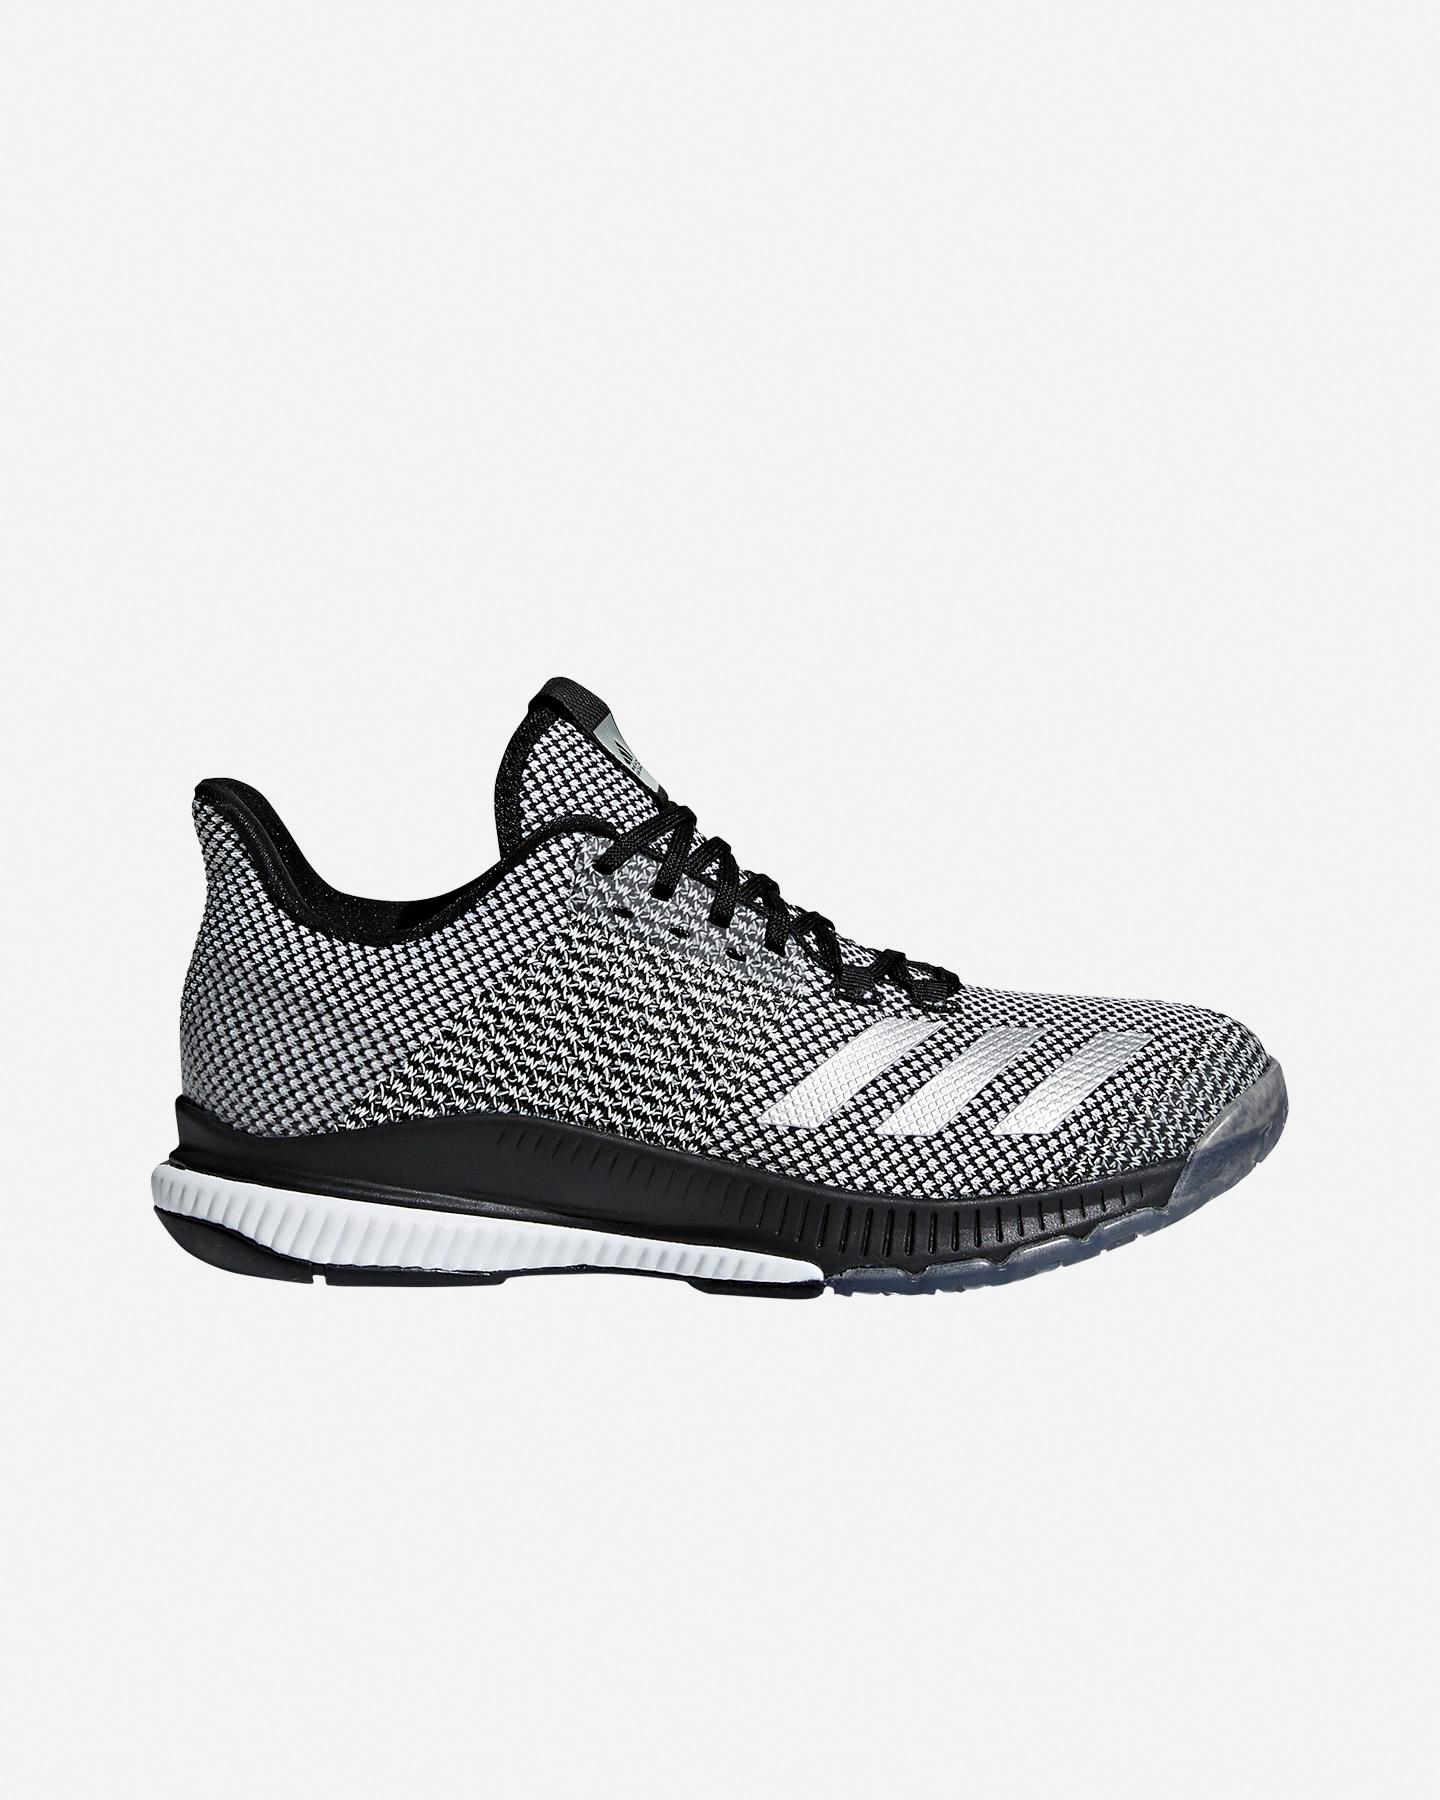 adidas pallavolo scarpe